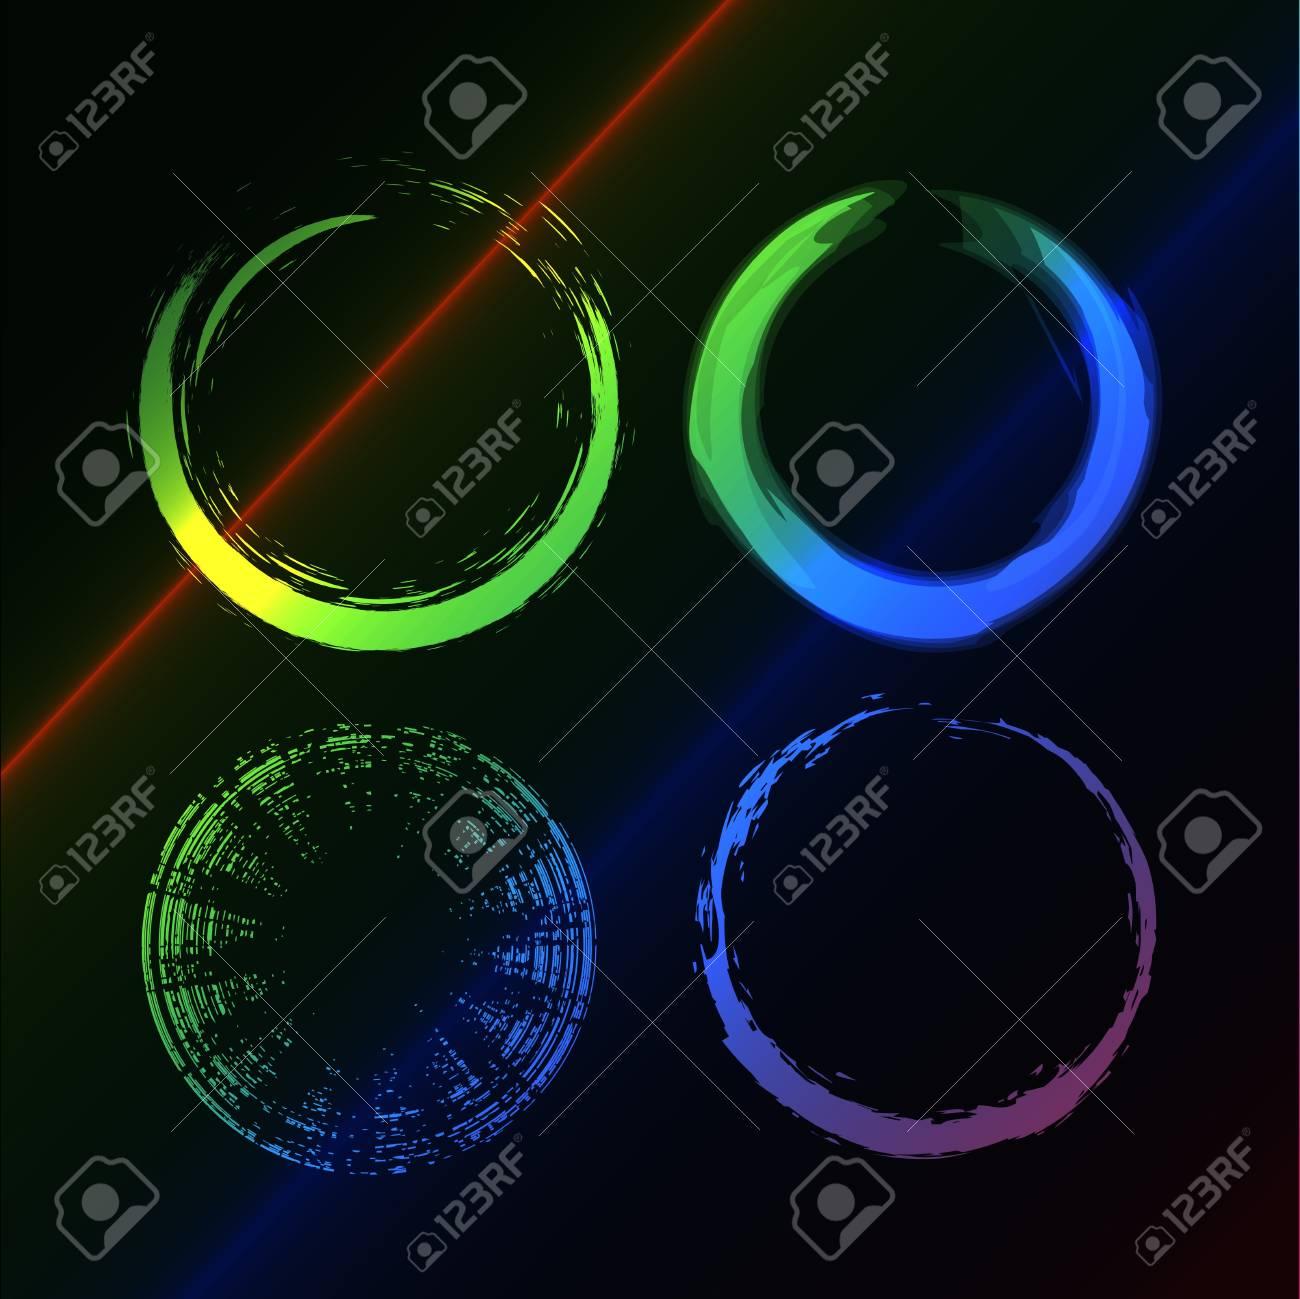 Grunge brushes line circle, illustration Stock Vector - 6978612